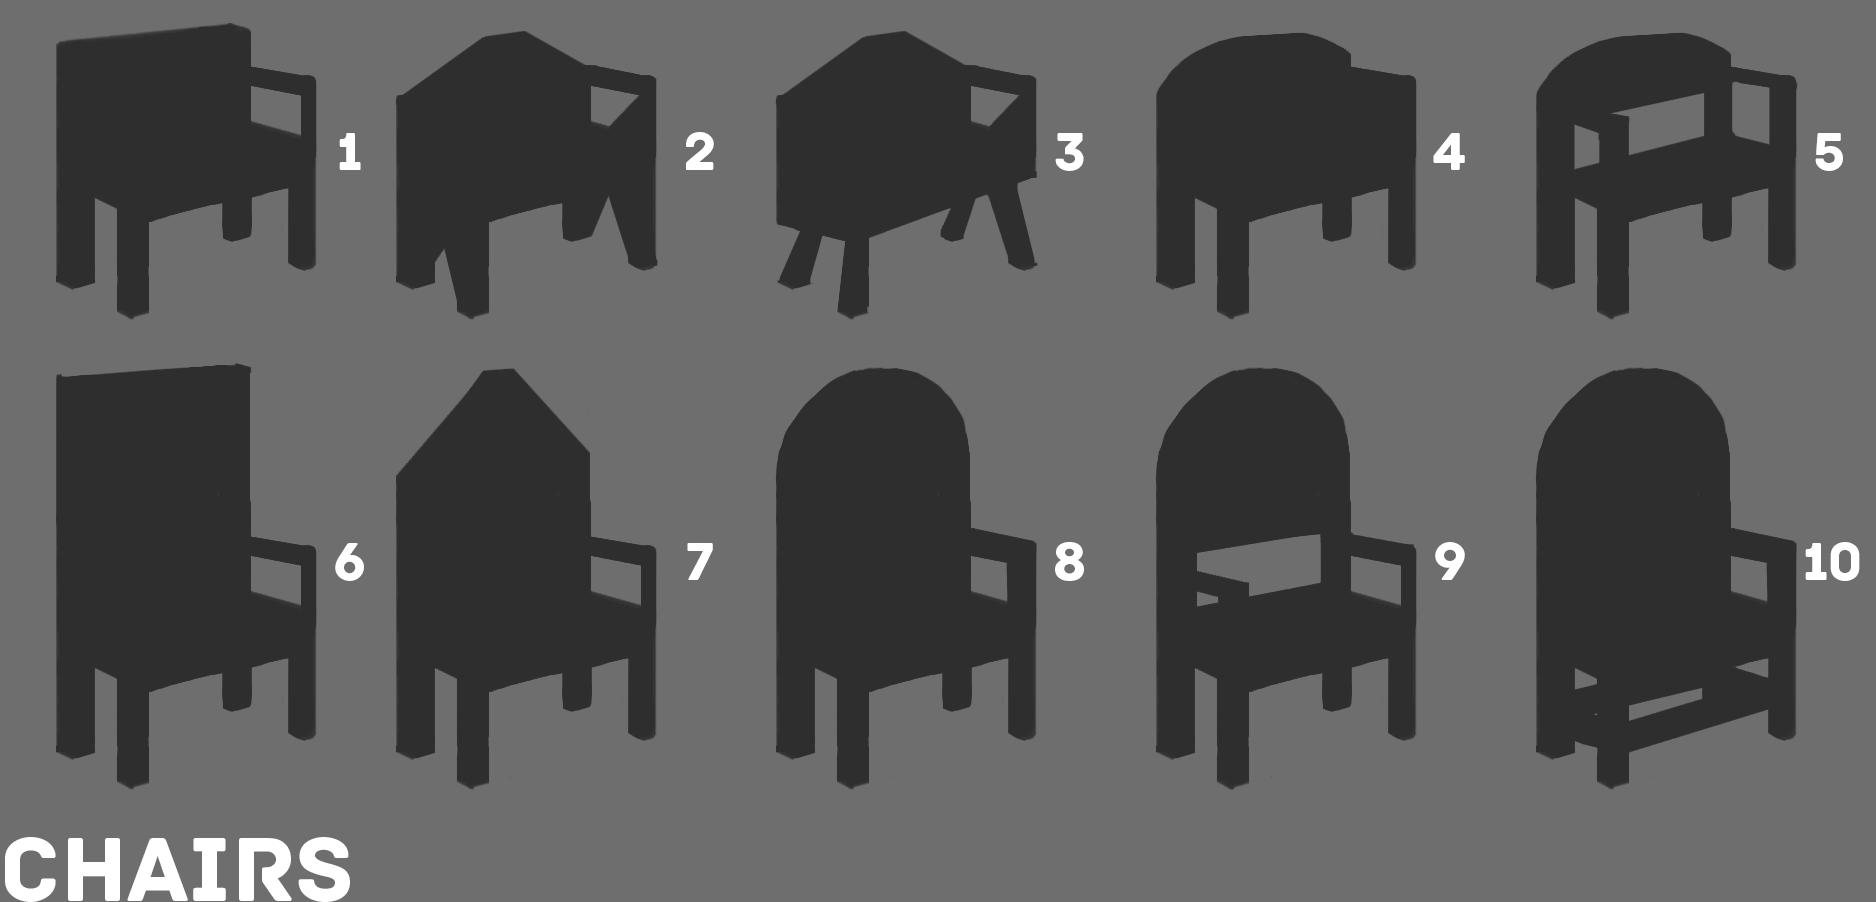 7a RD1 Chairs Thumbnails V1